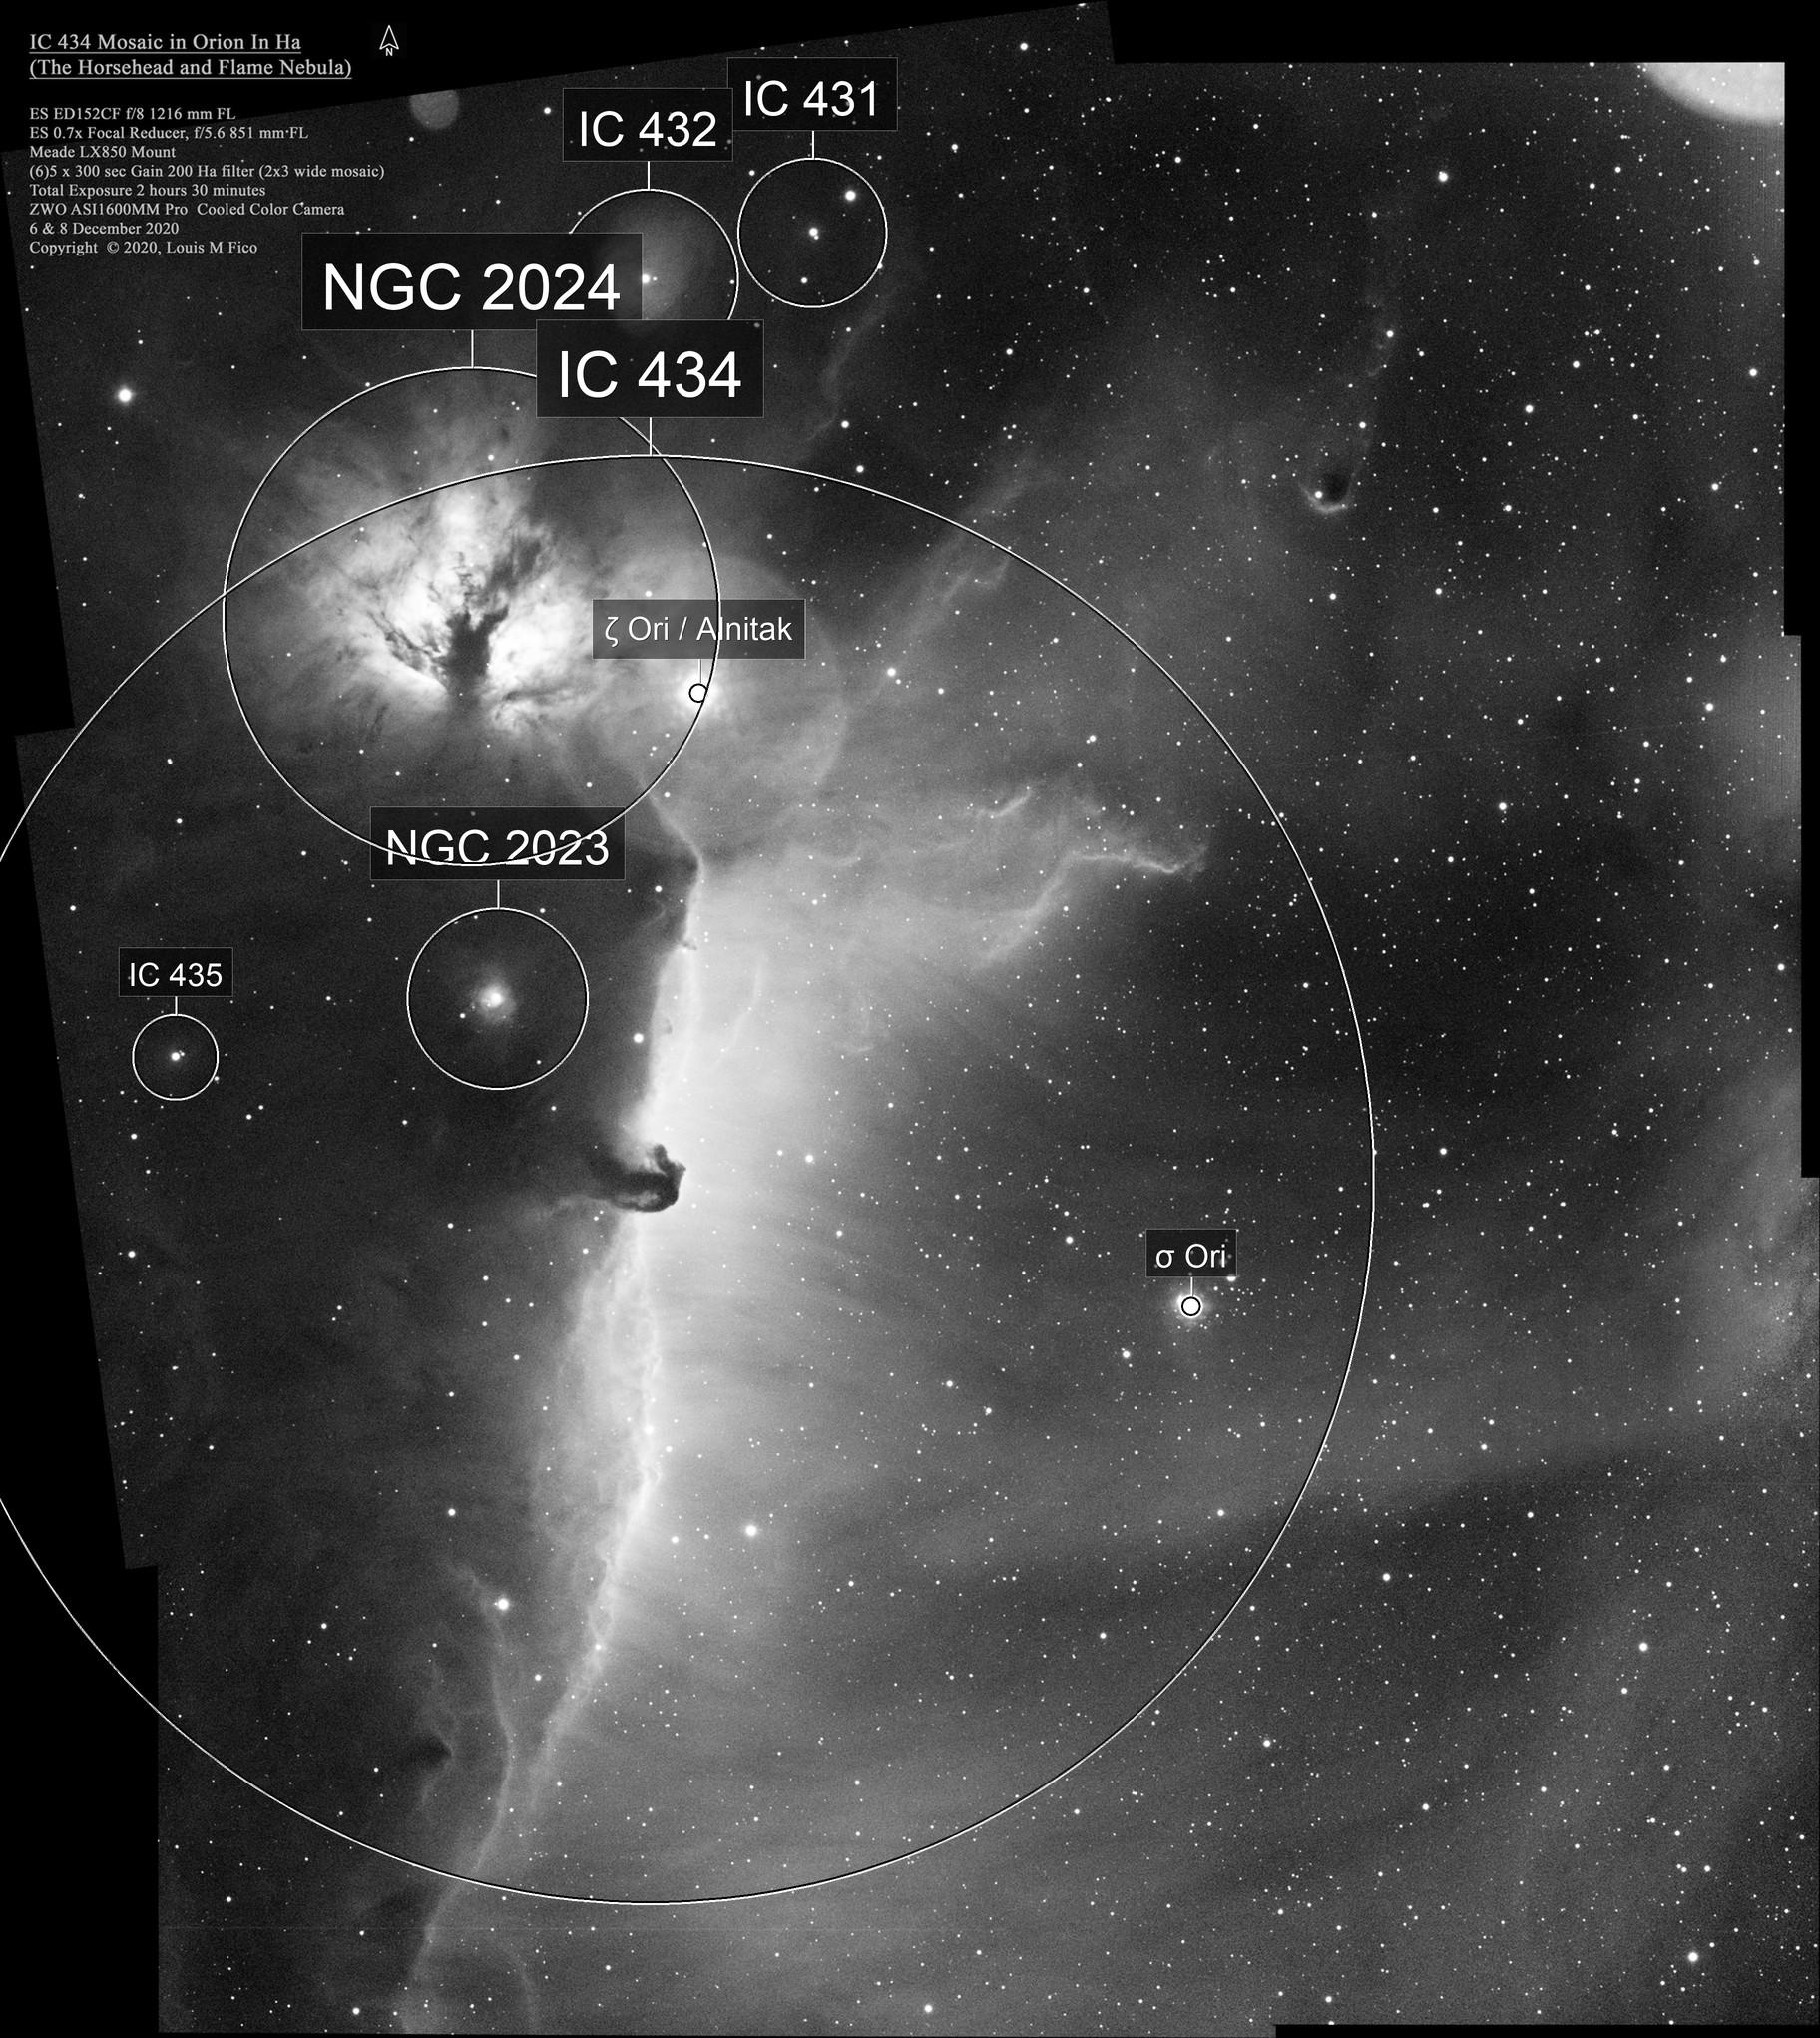 Horsehead and Flame Nebula 2x3 Mosaic